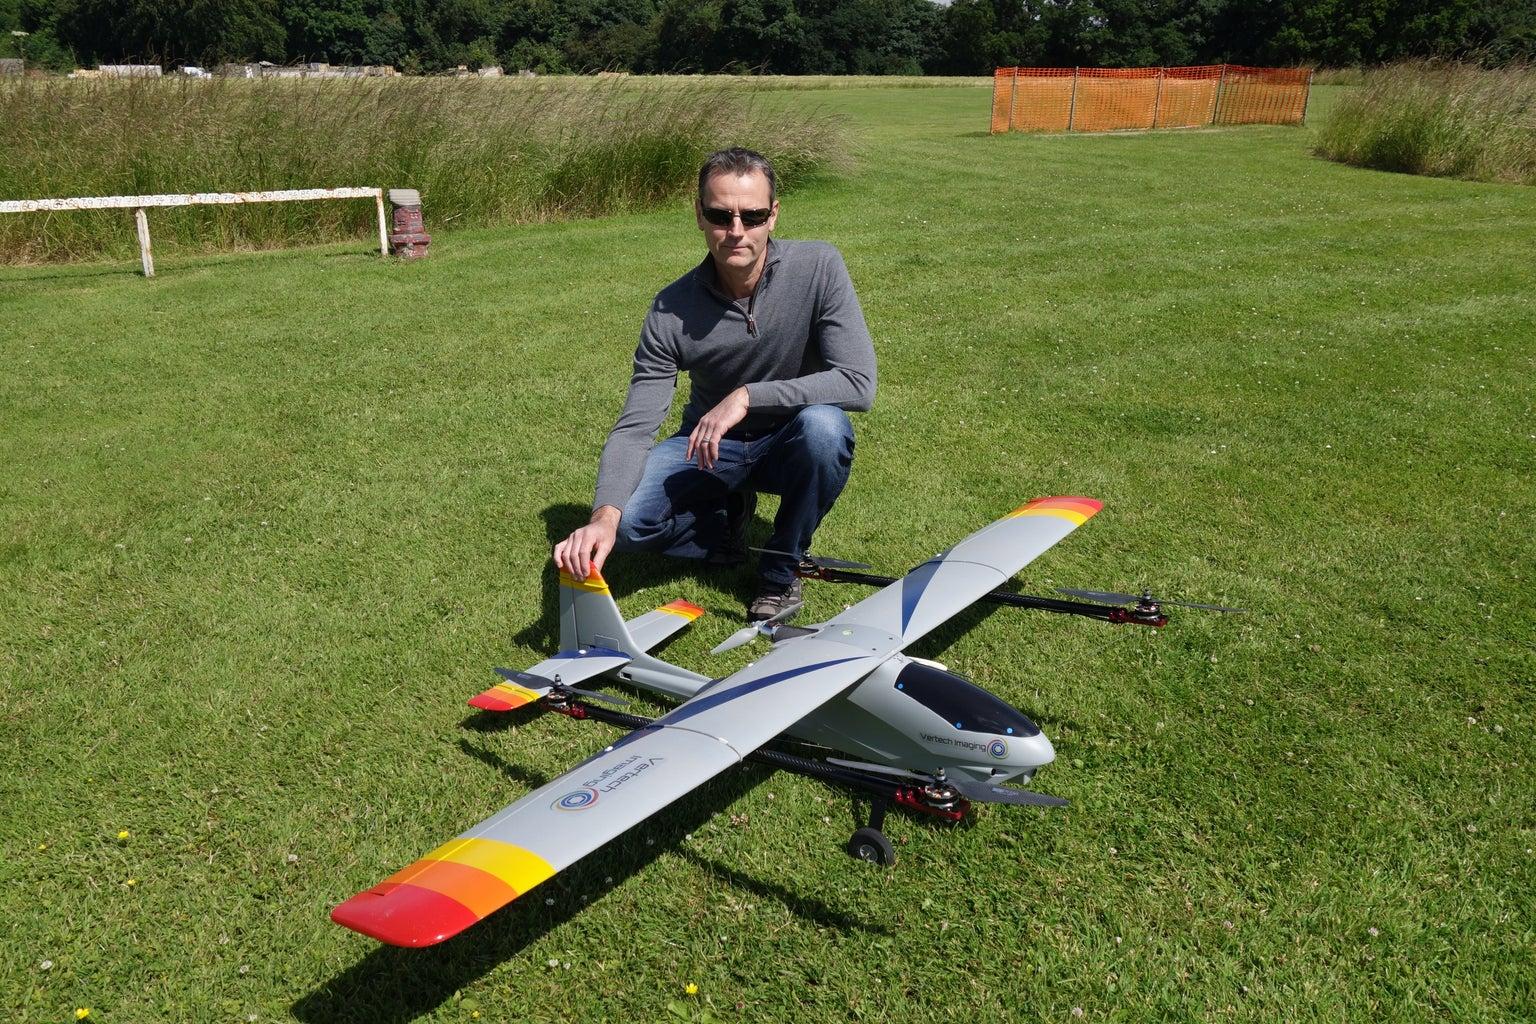 Parameter Settings and Flight Testing